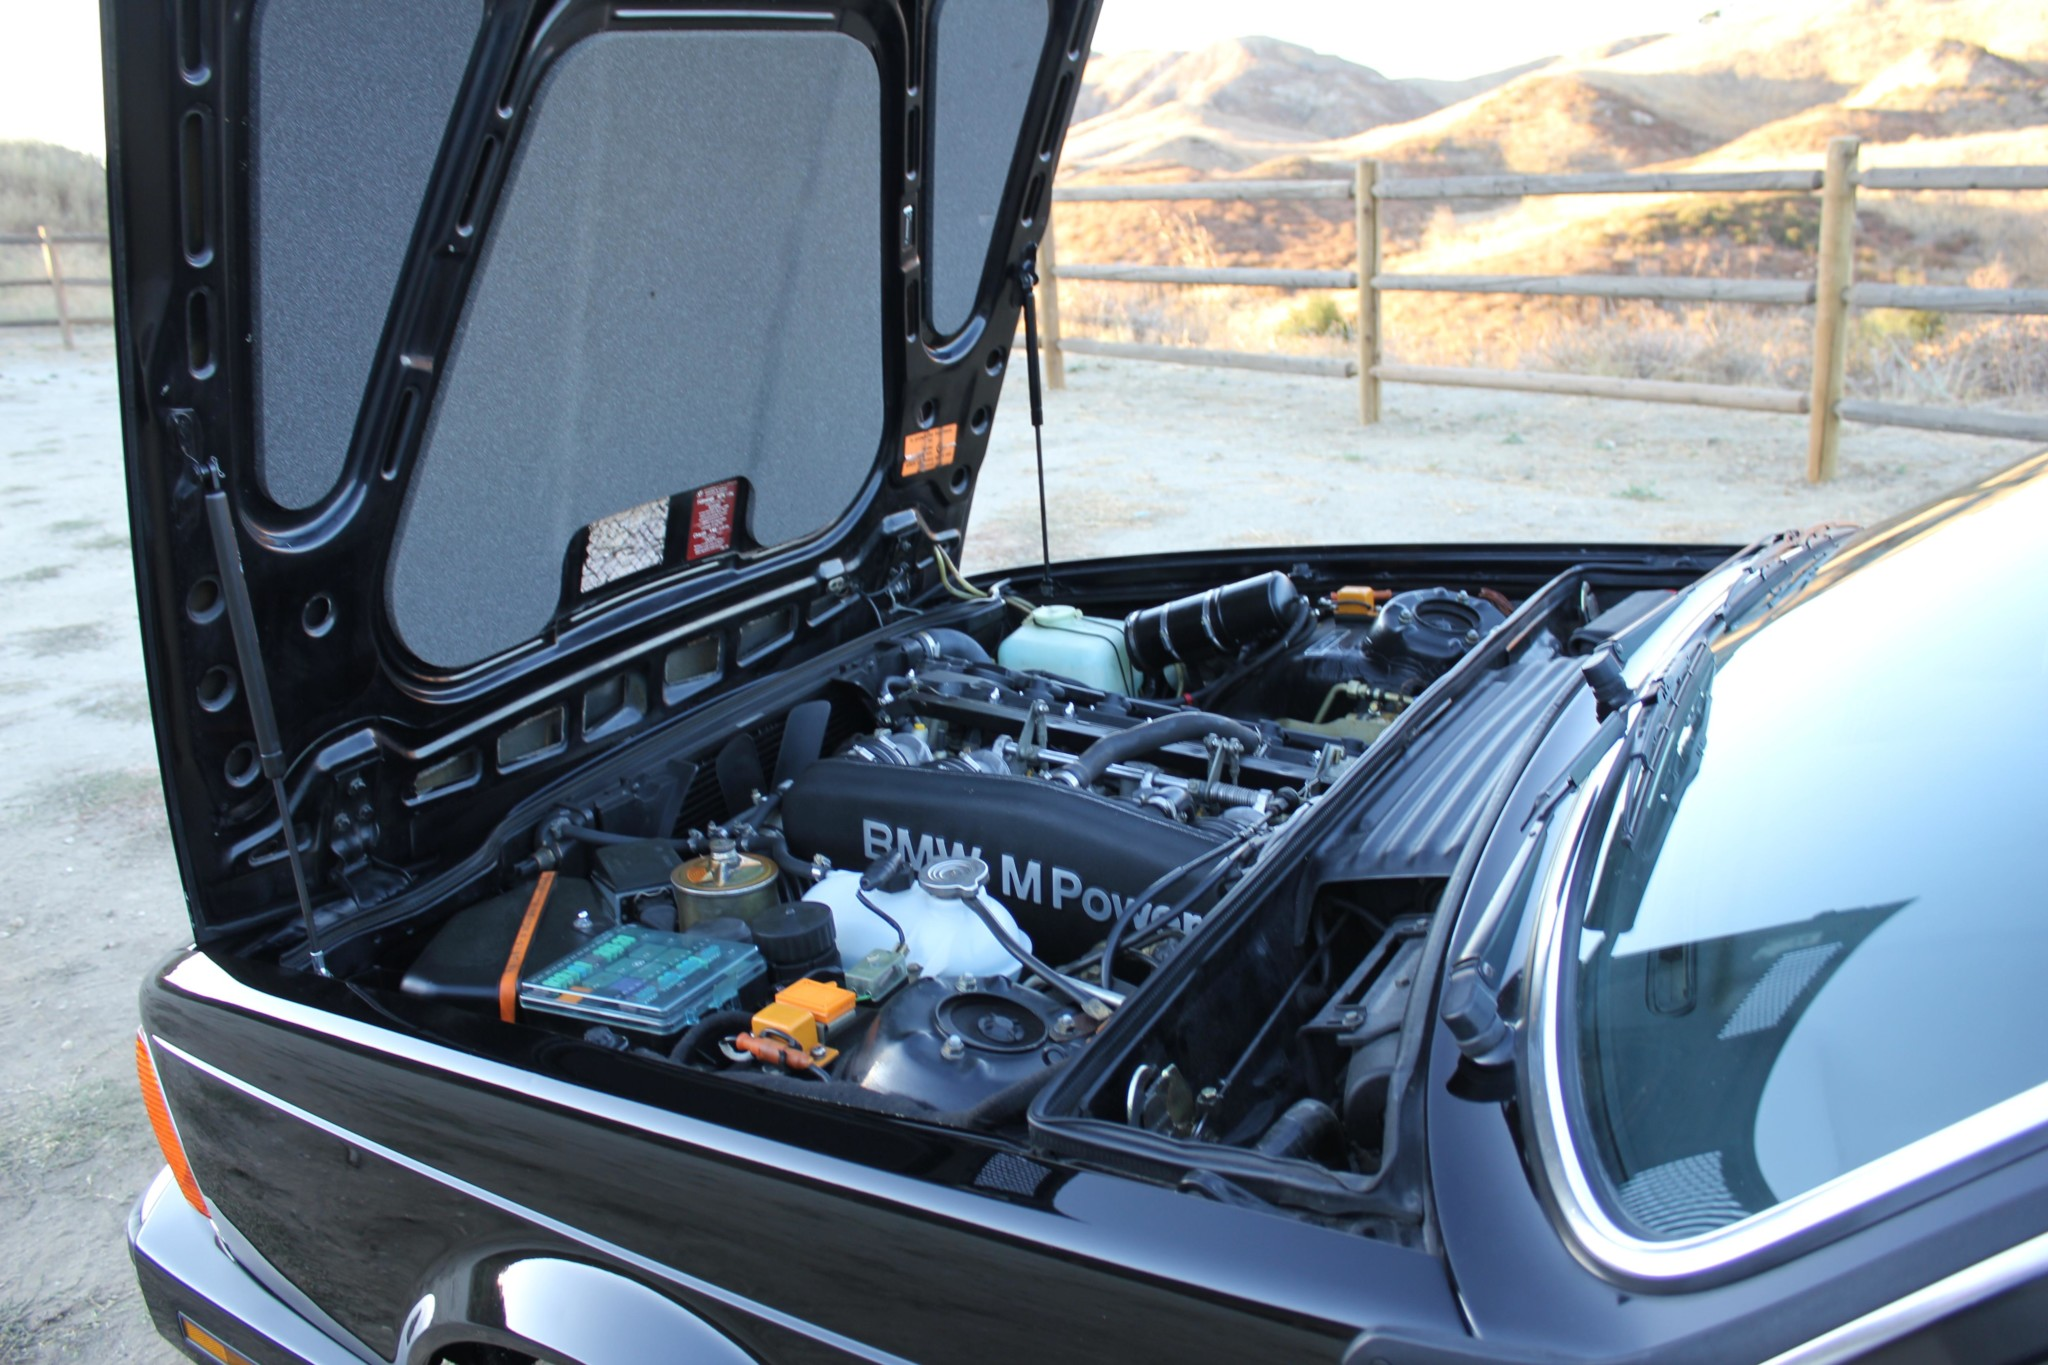 1988 bmw M6 kent classic cars (79).jpg